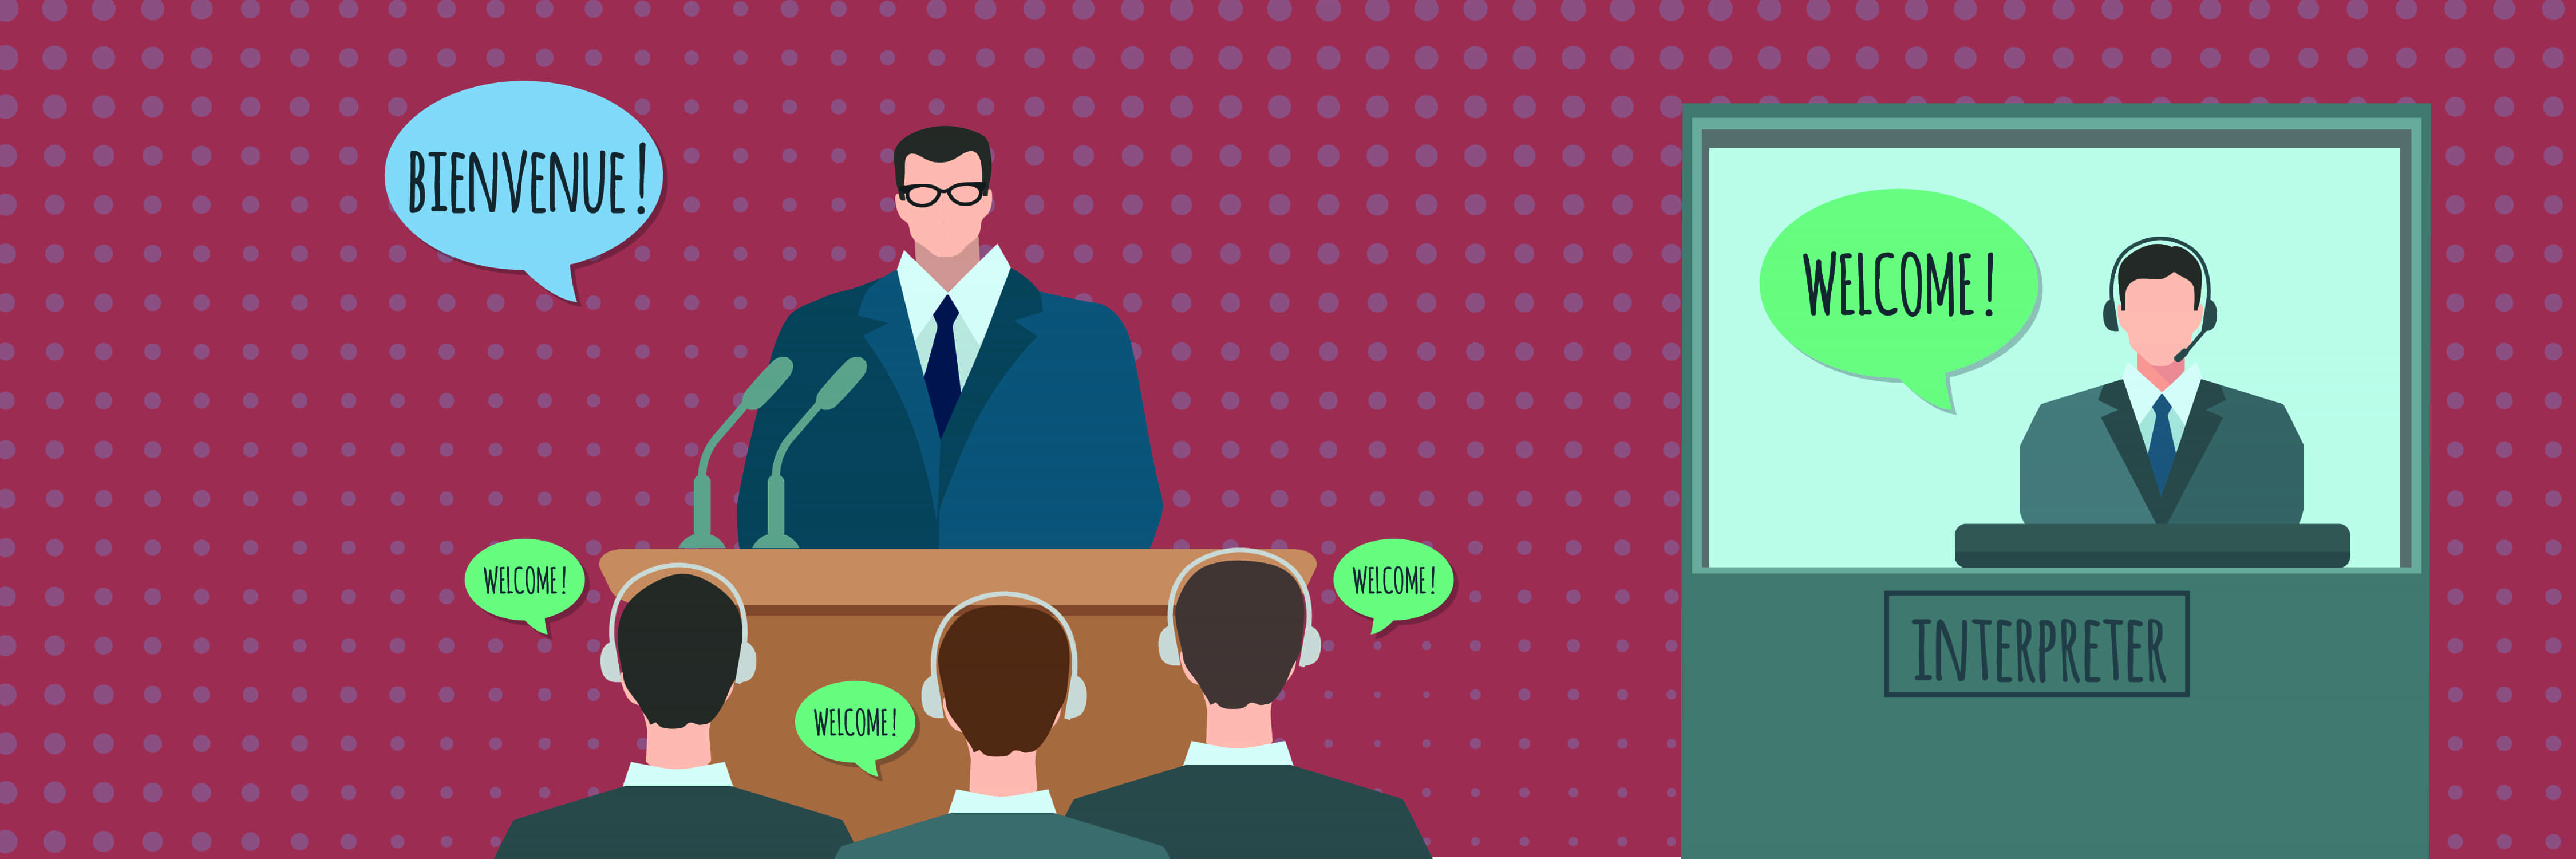 simultaneous interpretation language translation